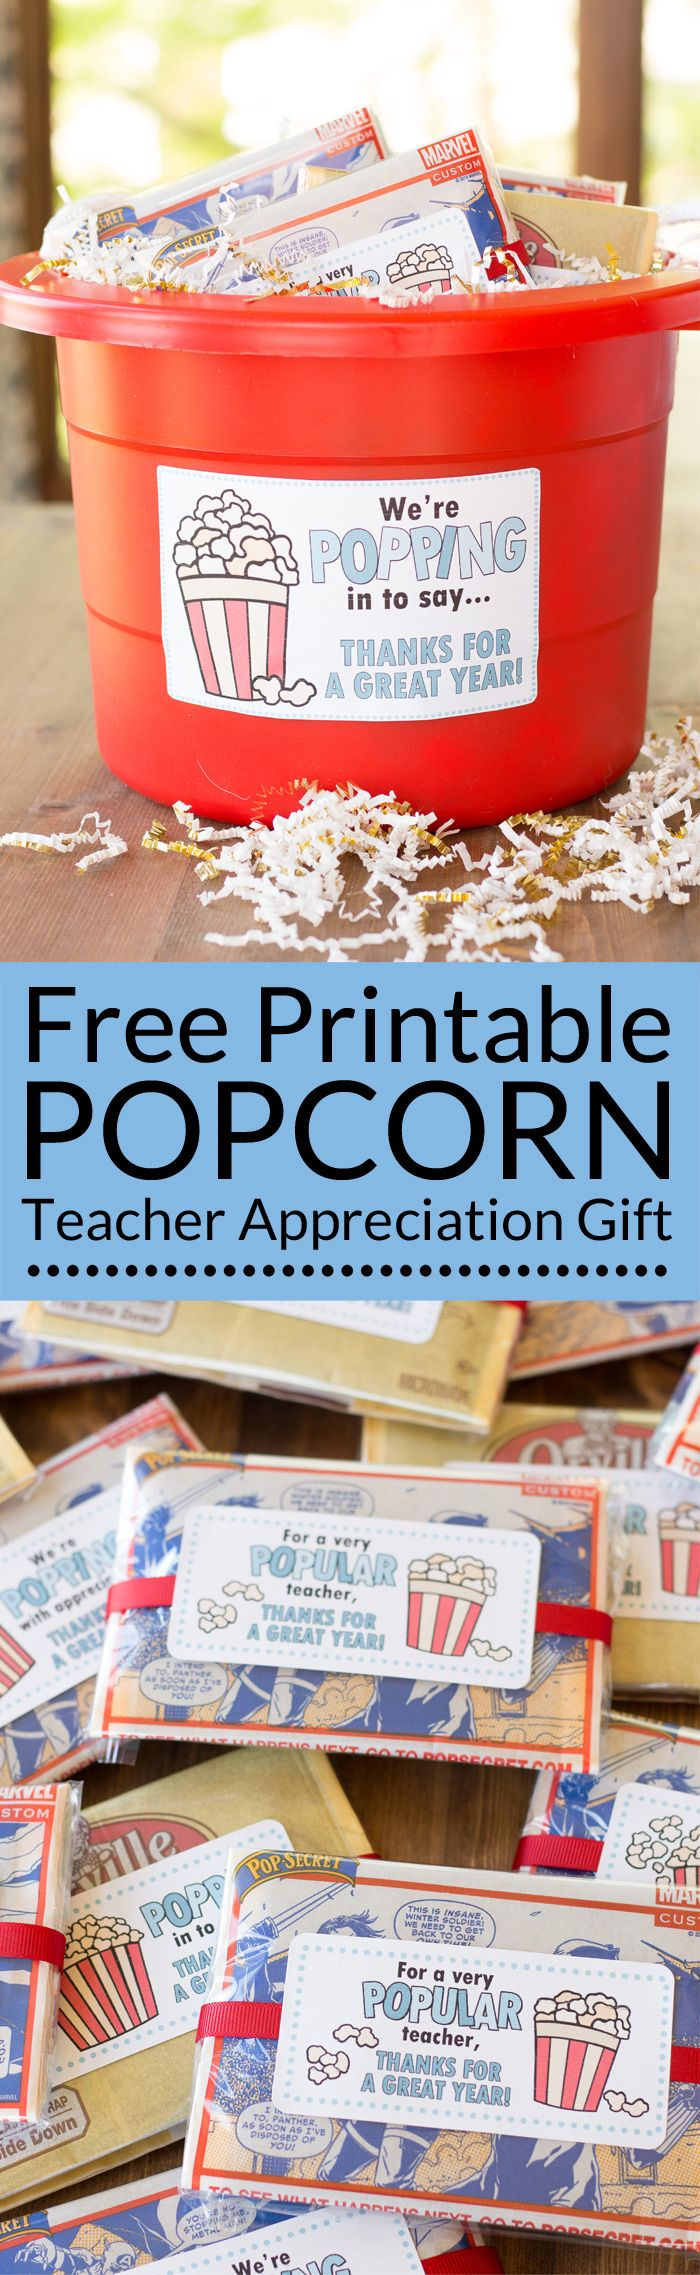 Popcorn Teacher Appreciation Gifts